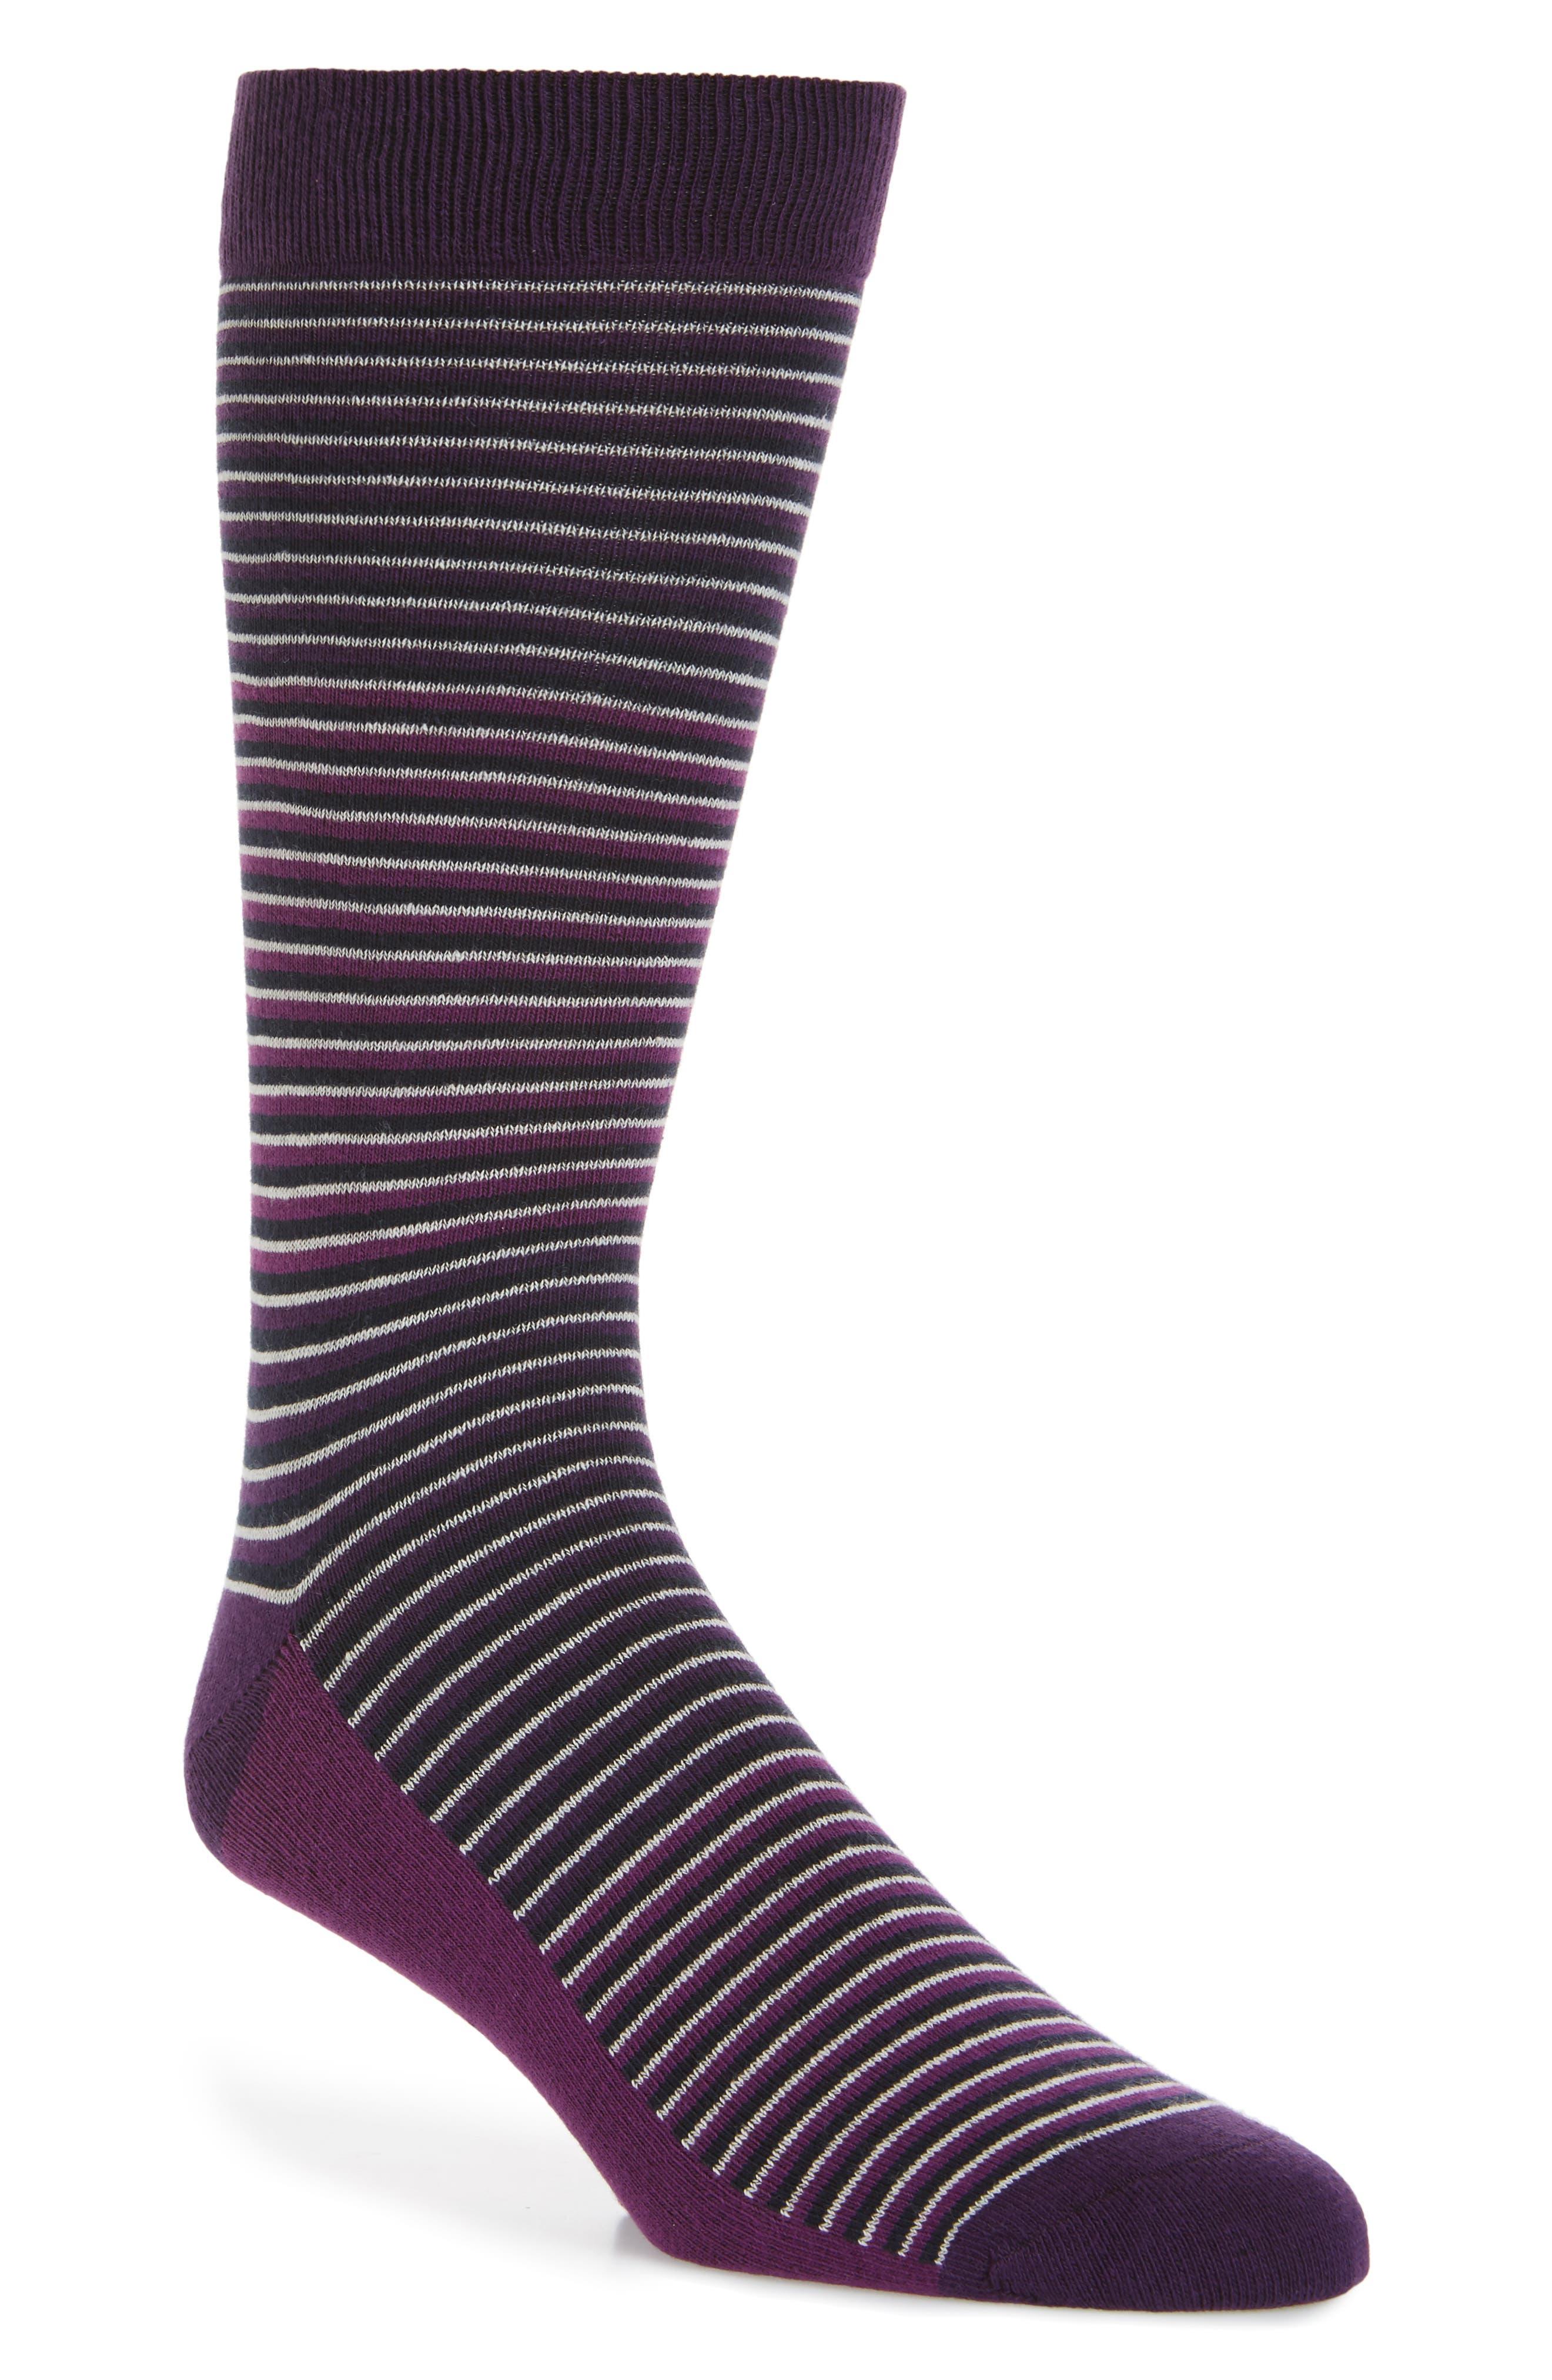 Chapel Stripe Socks,                             Main thumbnail 1, color,                             Purple